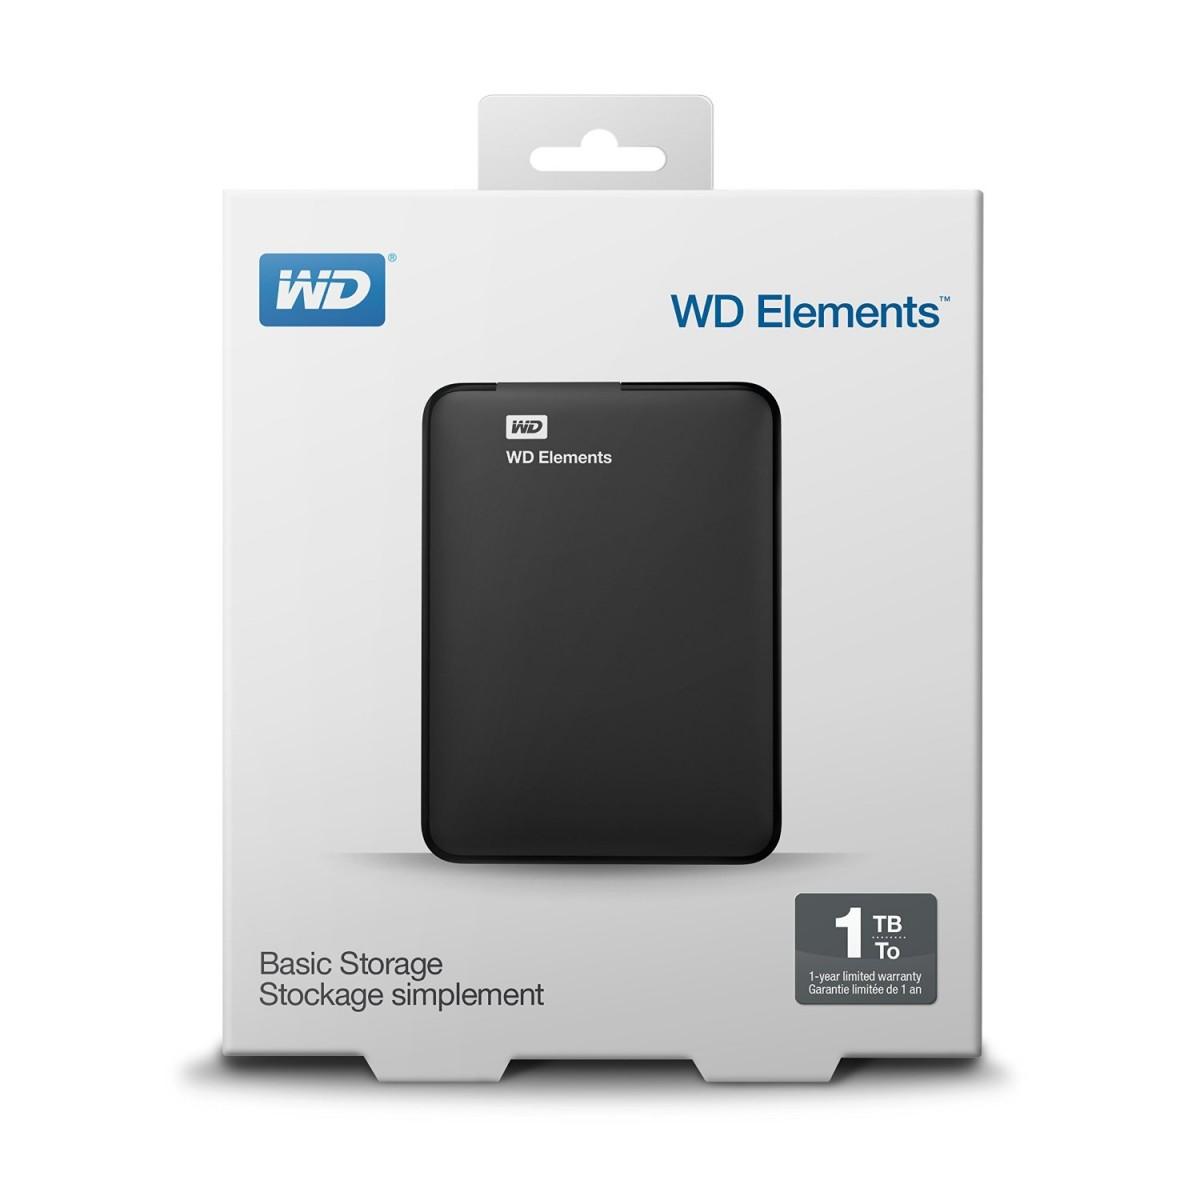 WD 1TB Elements External USB3.0 hard drive